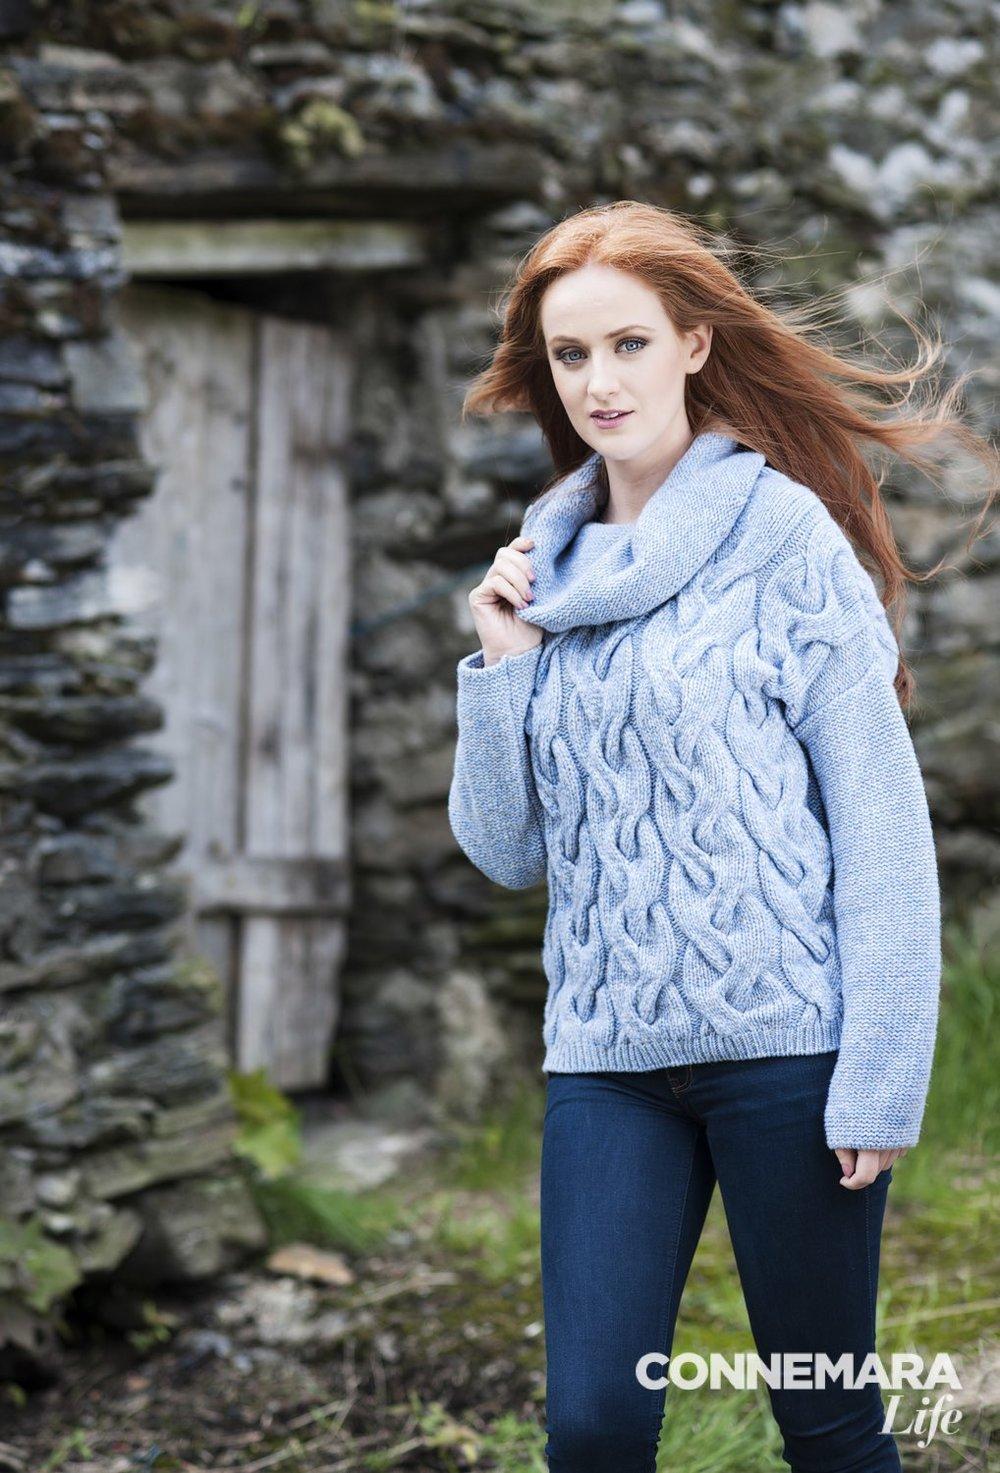 connemara-life-clifden-fashion-17.jpg